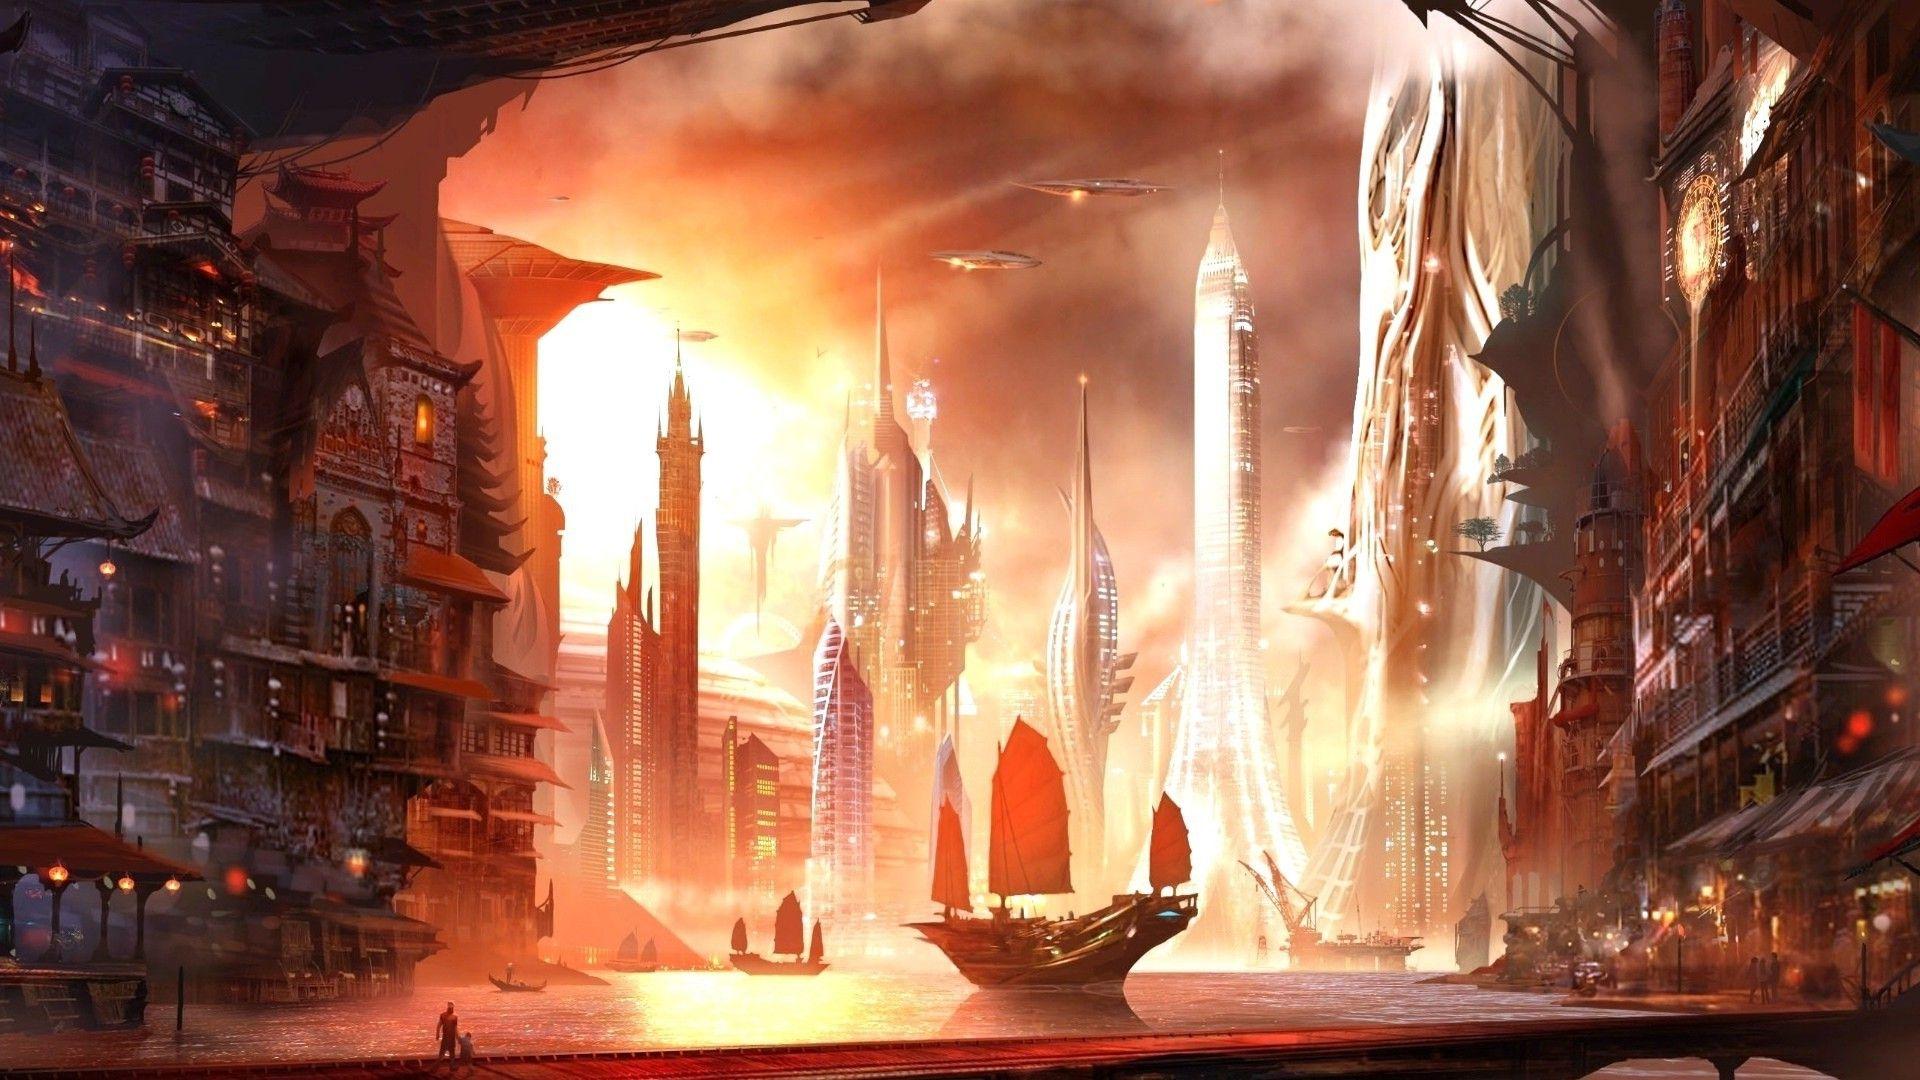 Asian City Fantasy City City Wallpaper Futuristic City